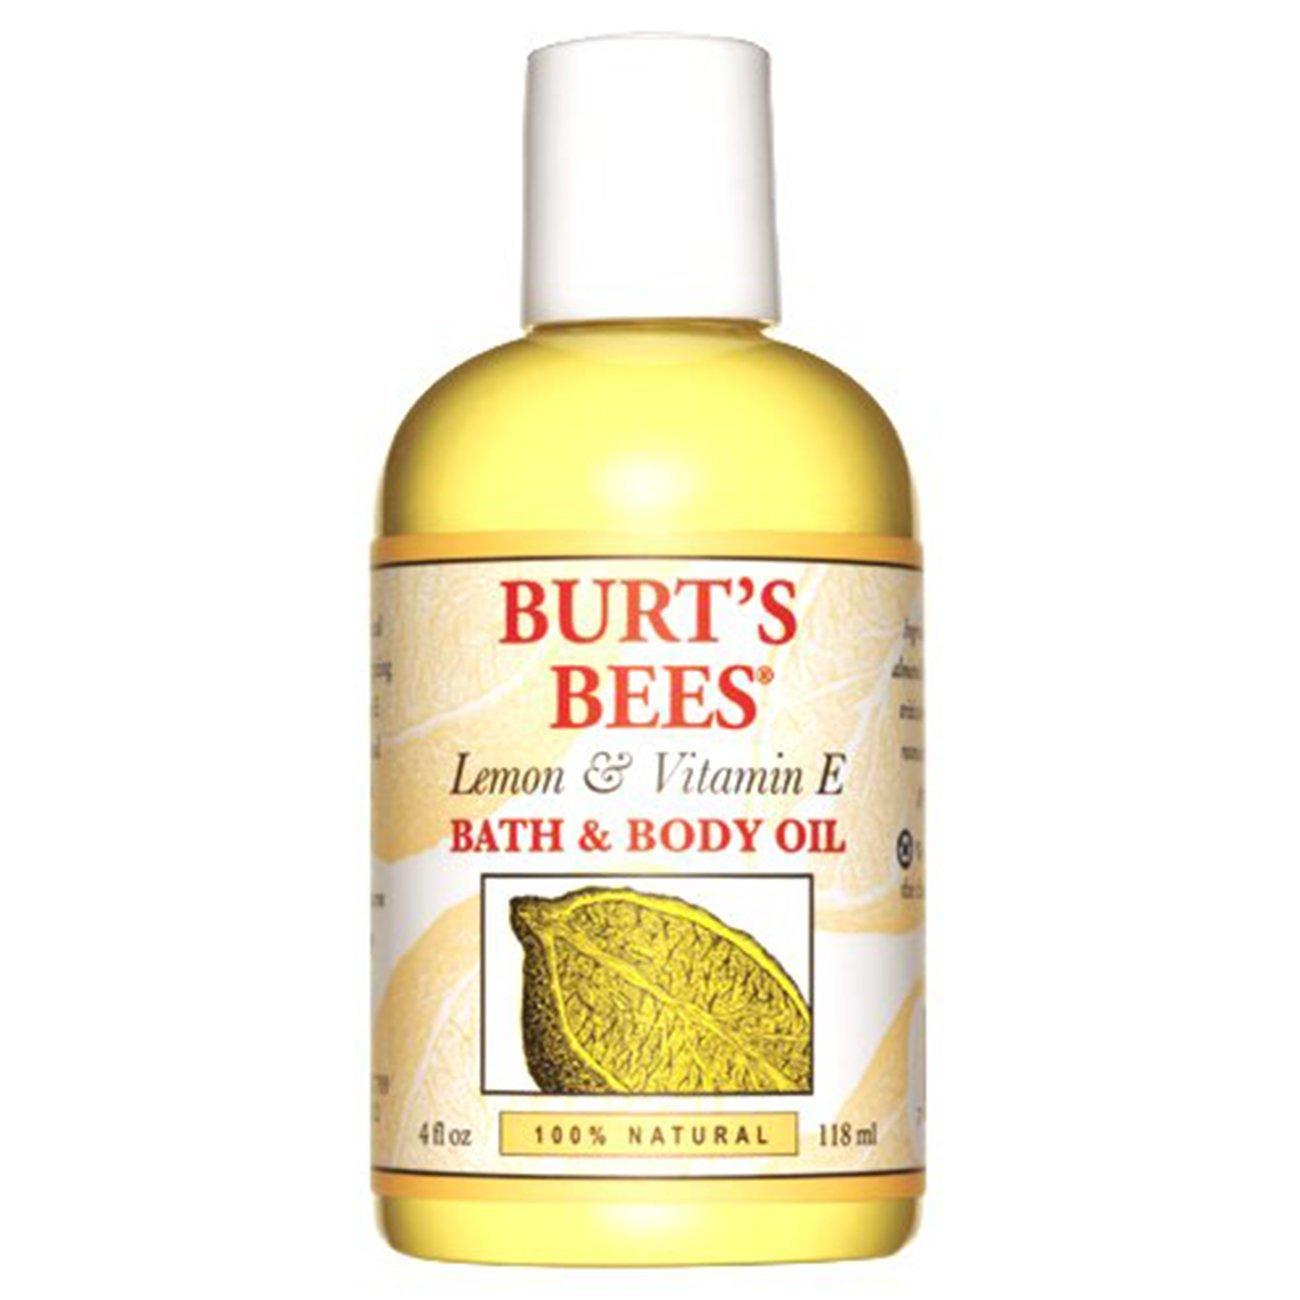 Burt's Bees 100% Natural Lemon and Vitamin E Body and Bath Oil - 4 Ounce Bottle Burt' s Bees 792850094994